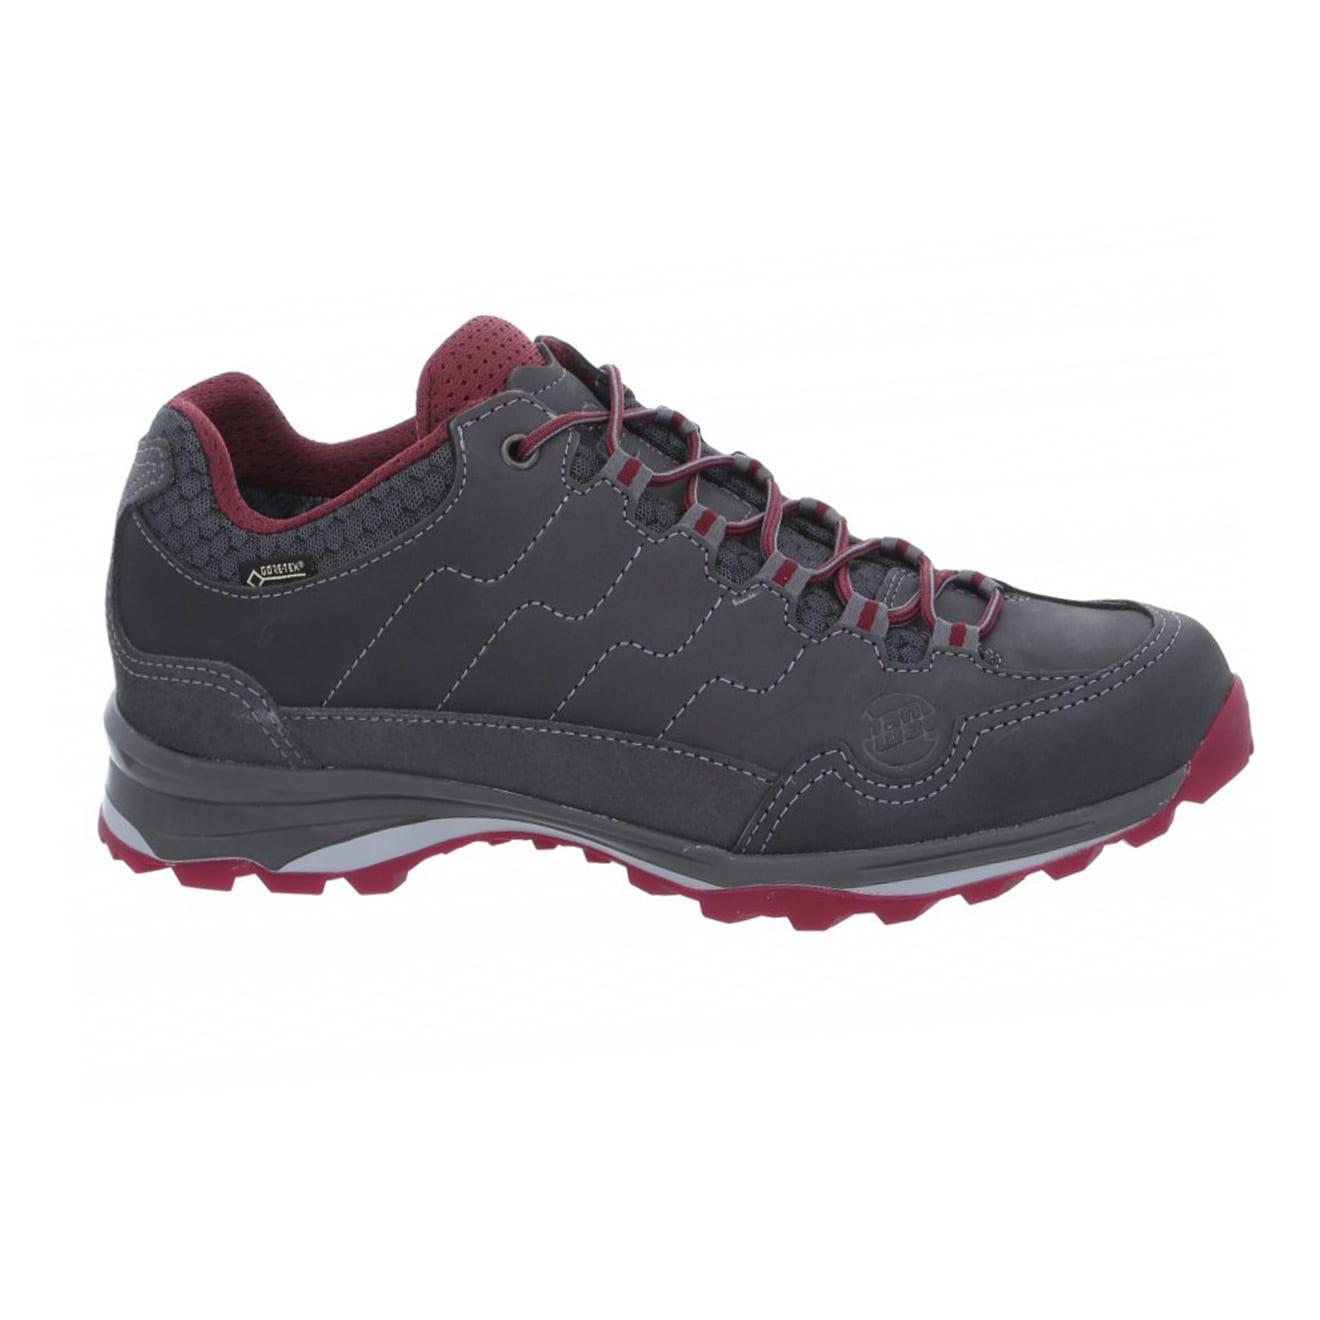 Hanwag Robin Light Lady GTX Walking Shoes Asphalt / Dark Garnet